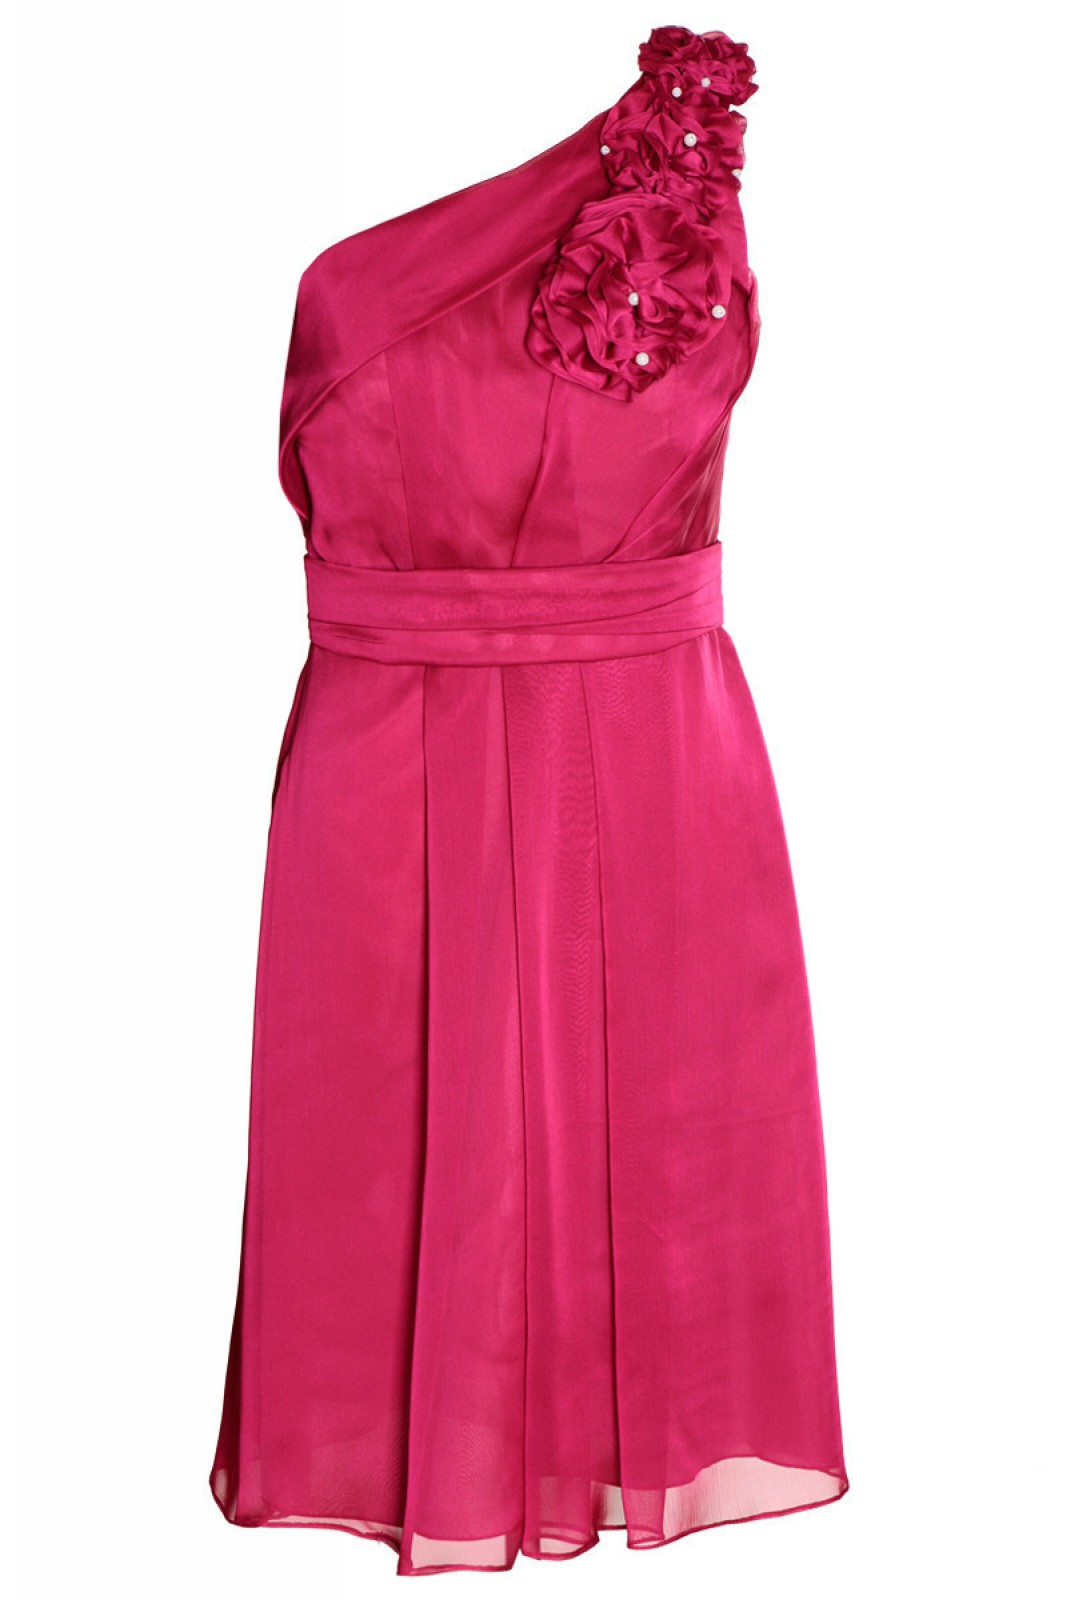 One Shoulder Chiffon Kleid rubinrot mit Blumenapplikation - ...